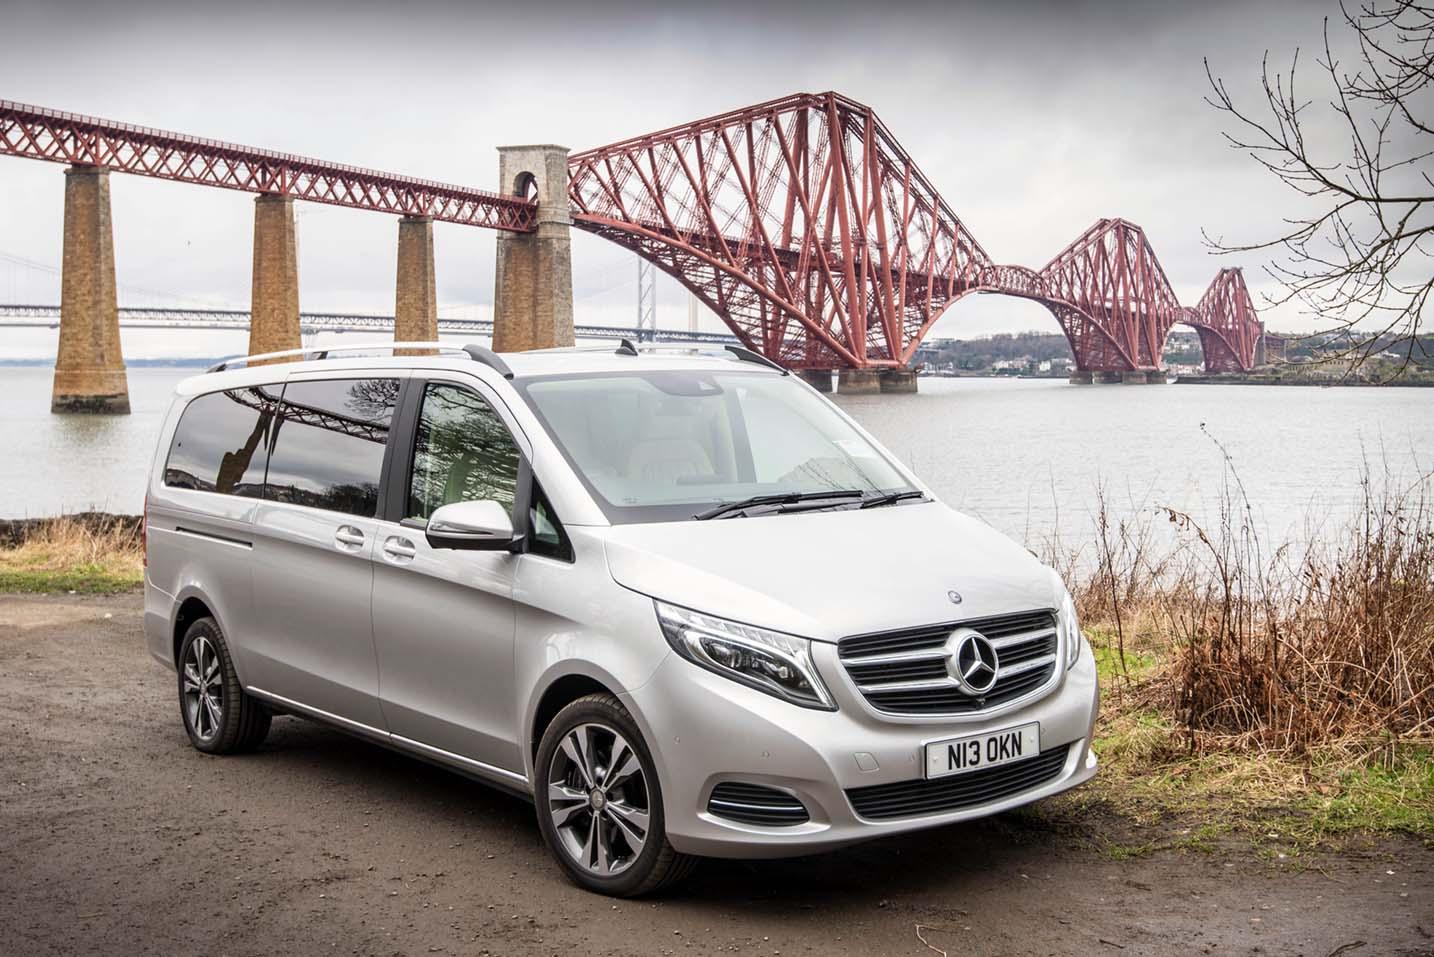 Chauffeur Hire Scotland